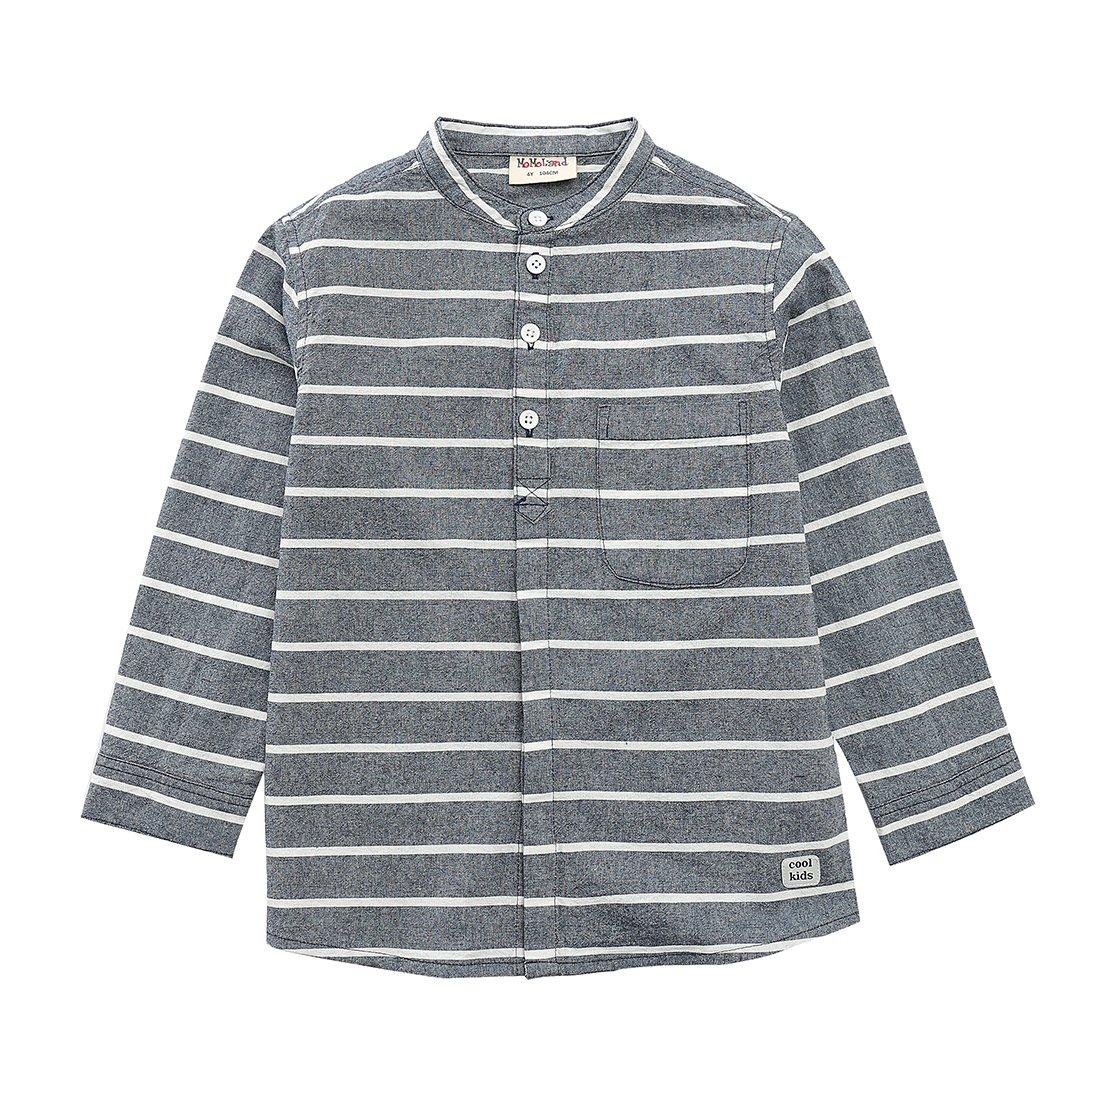 MOMOLAND Boys Long Sleeve Mandarin Collar Woven Button Down Shirt Linen Design Navy Stripes (10 Years, Navy and White Stripe)